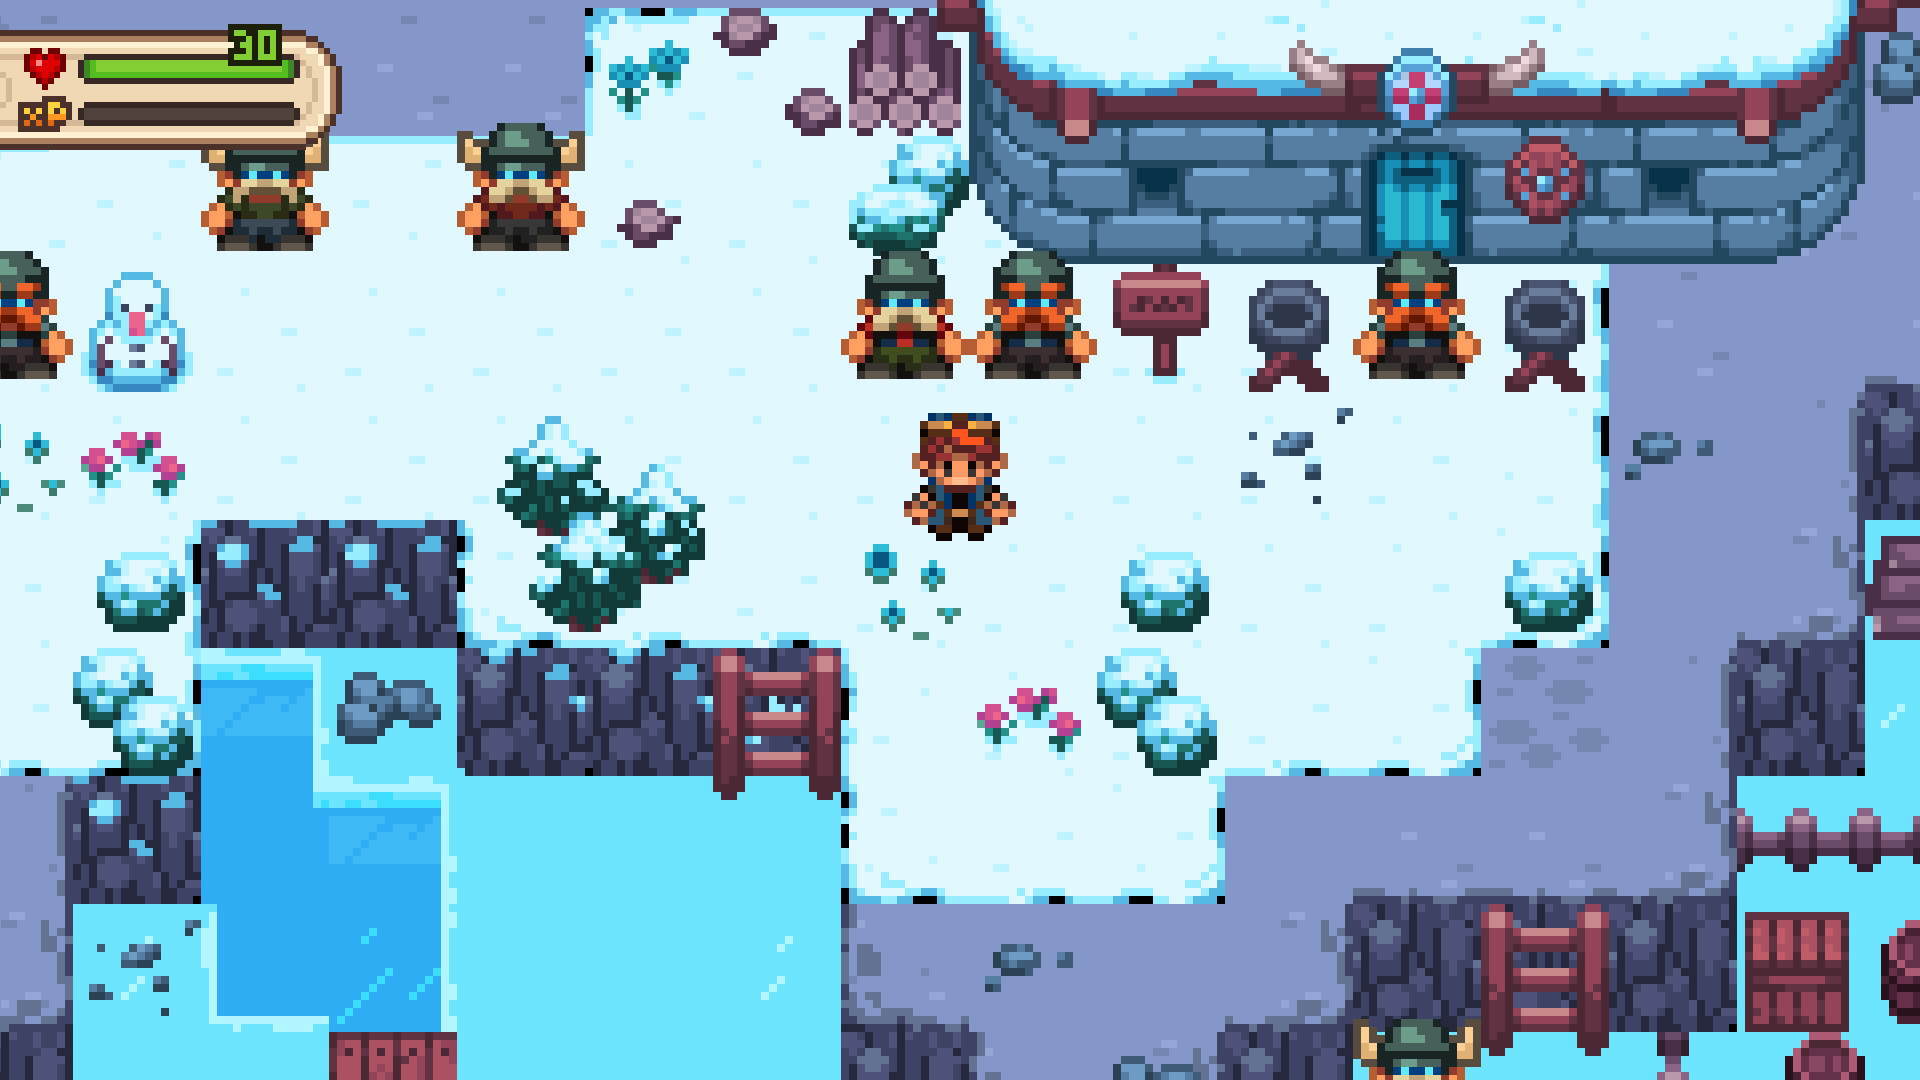 Evoland 2 screenshot 2